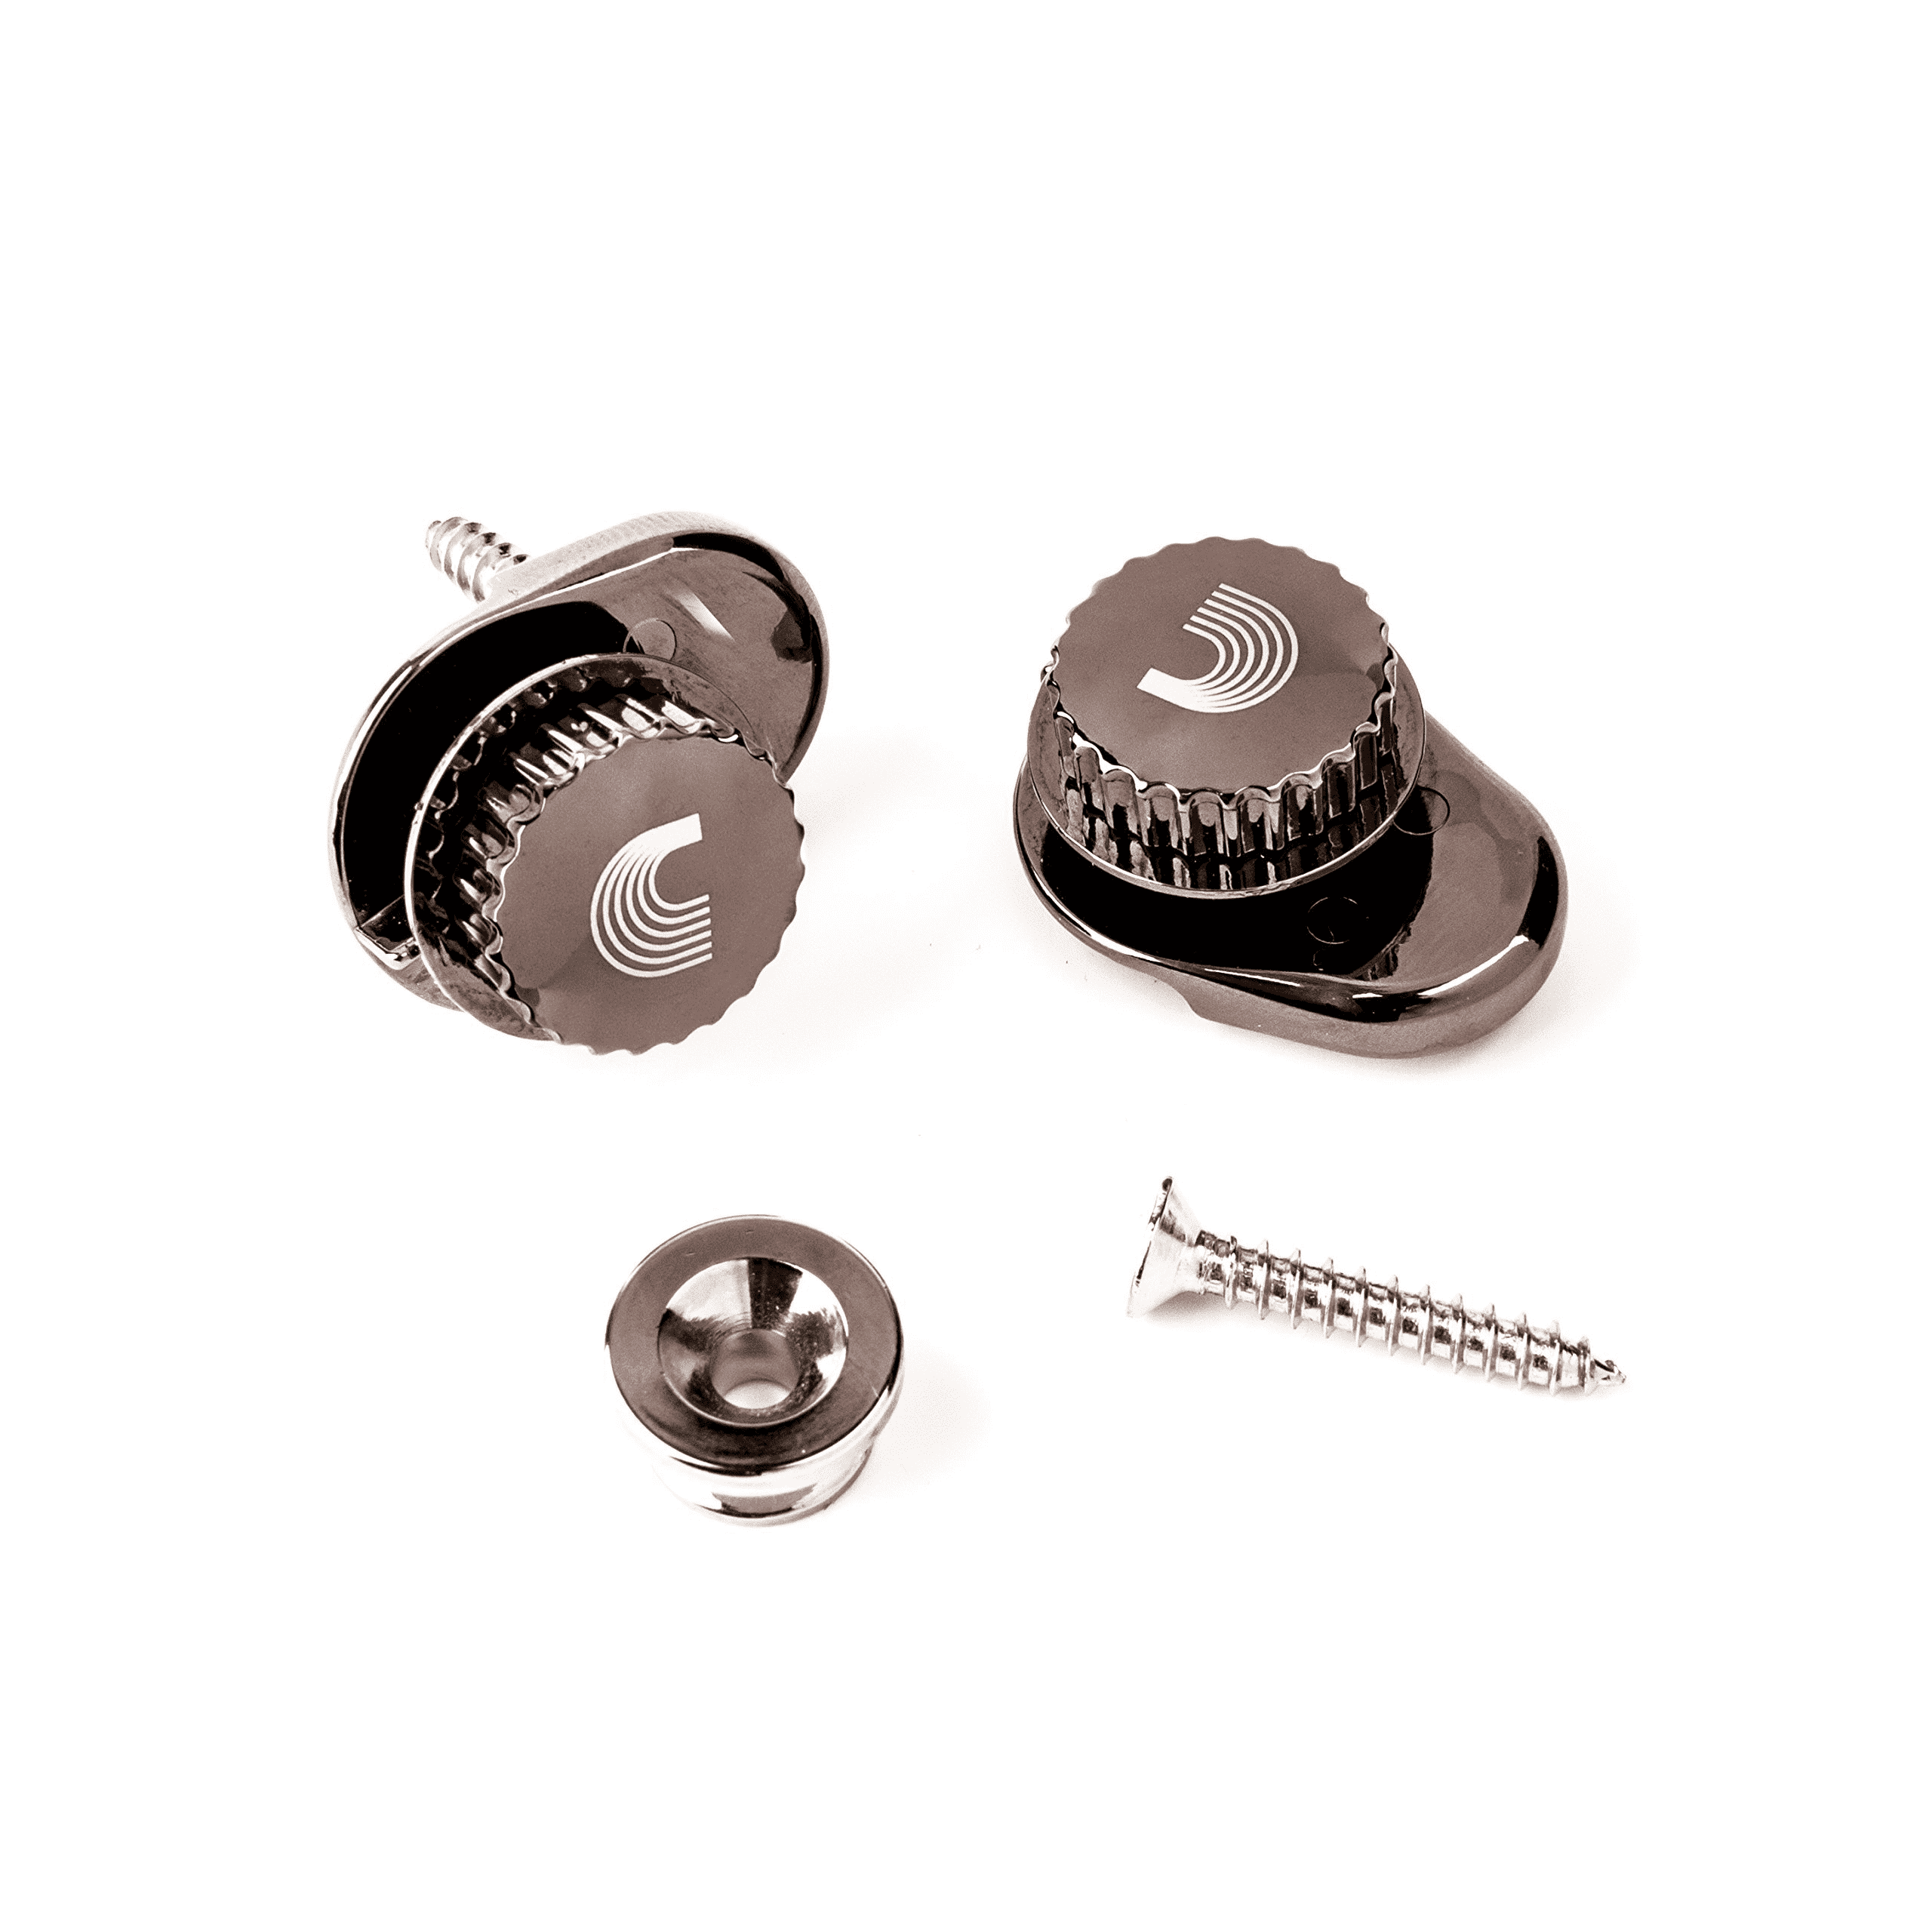 D'ADDARIO Strap Lock System